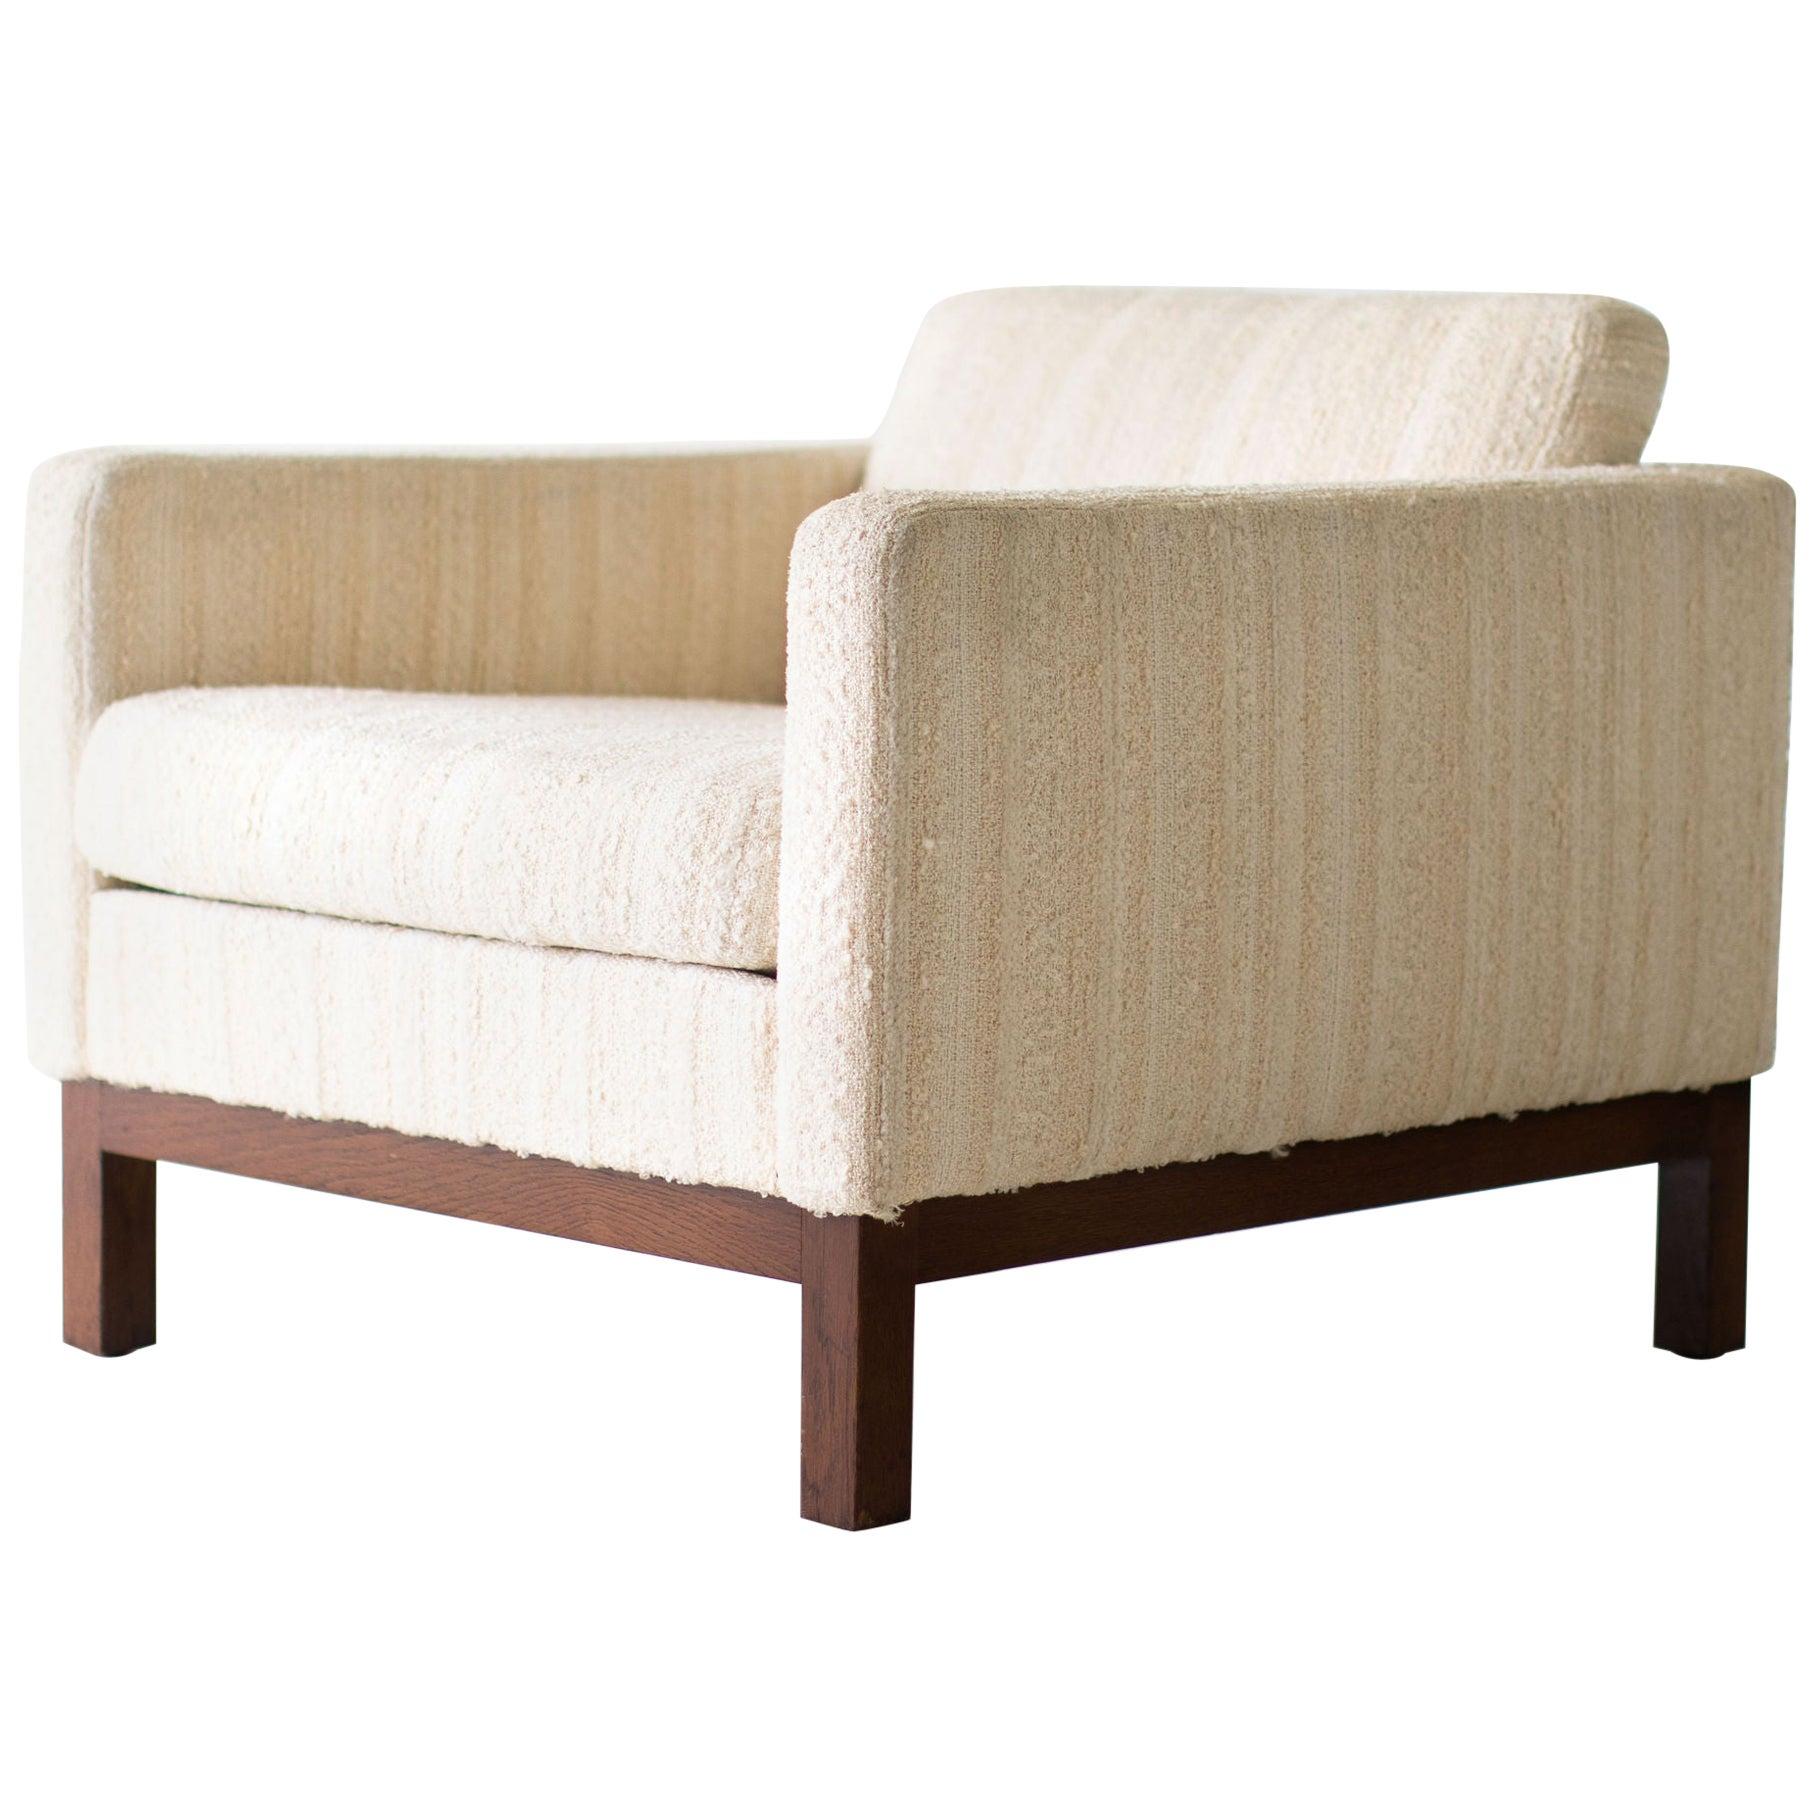 Milo Baughman Lounge Chair for James Inc.